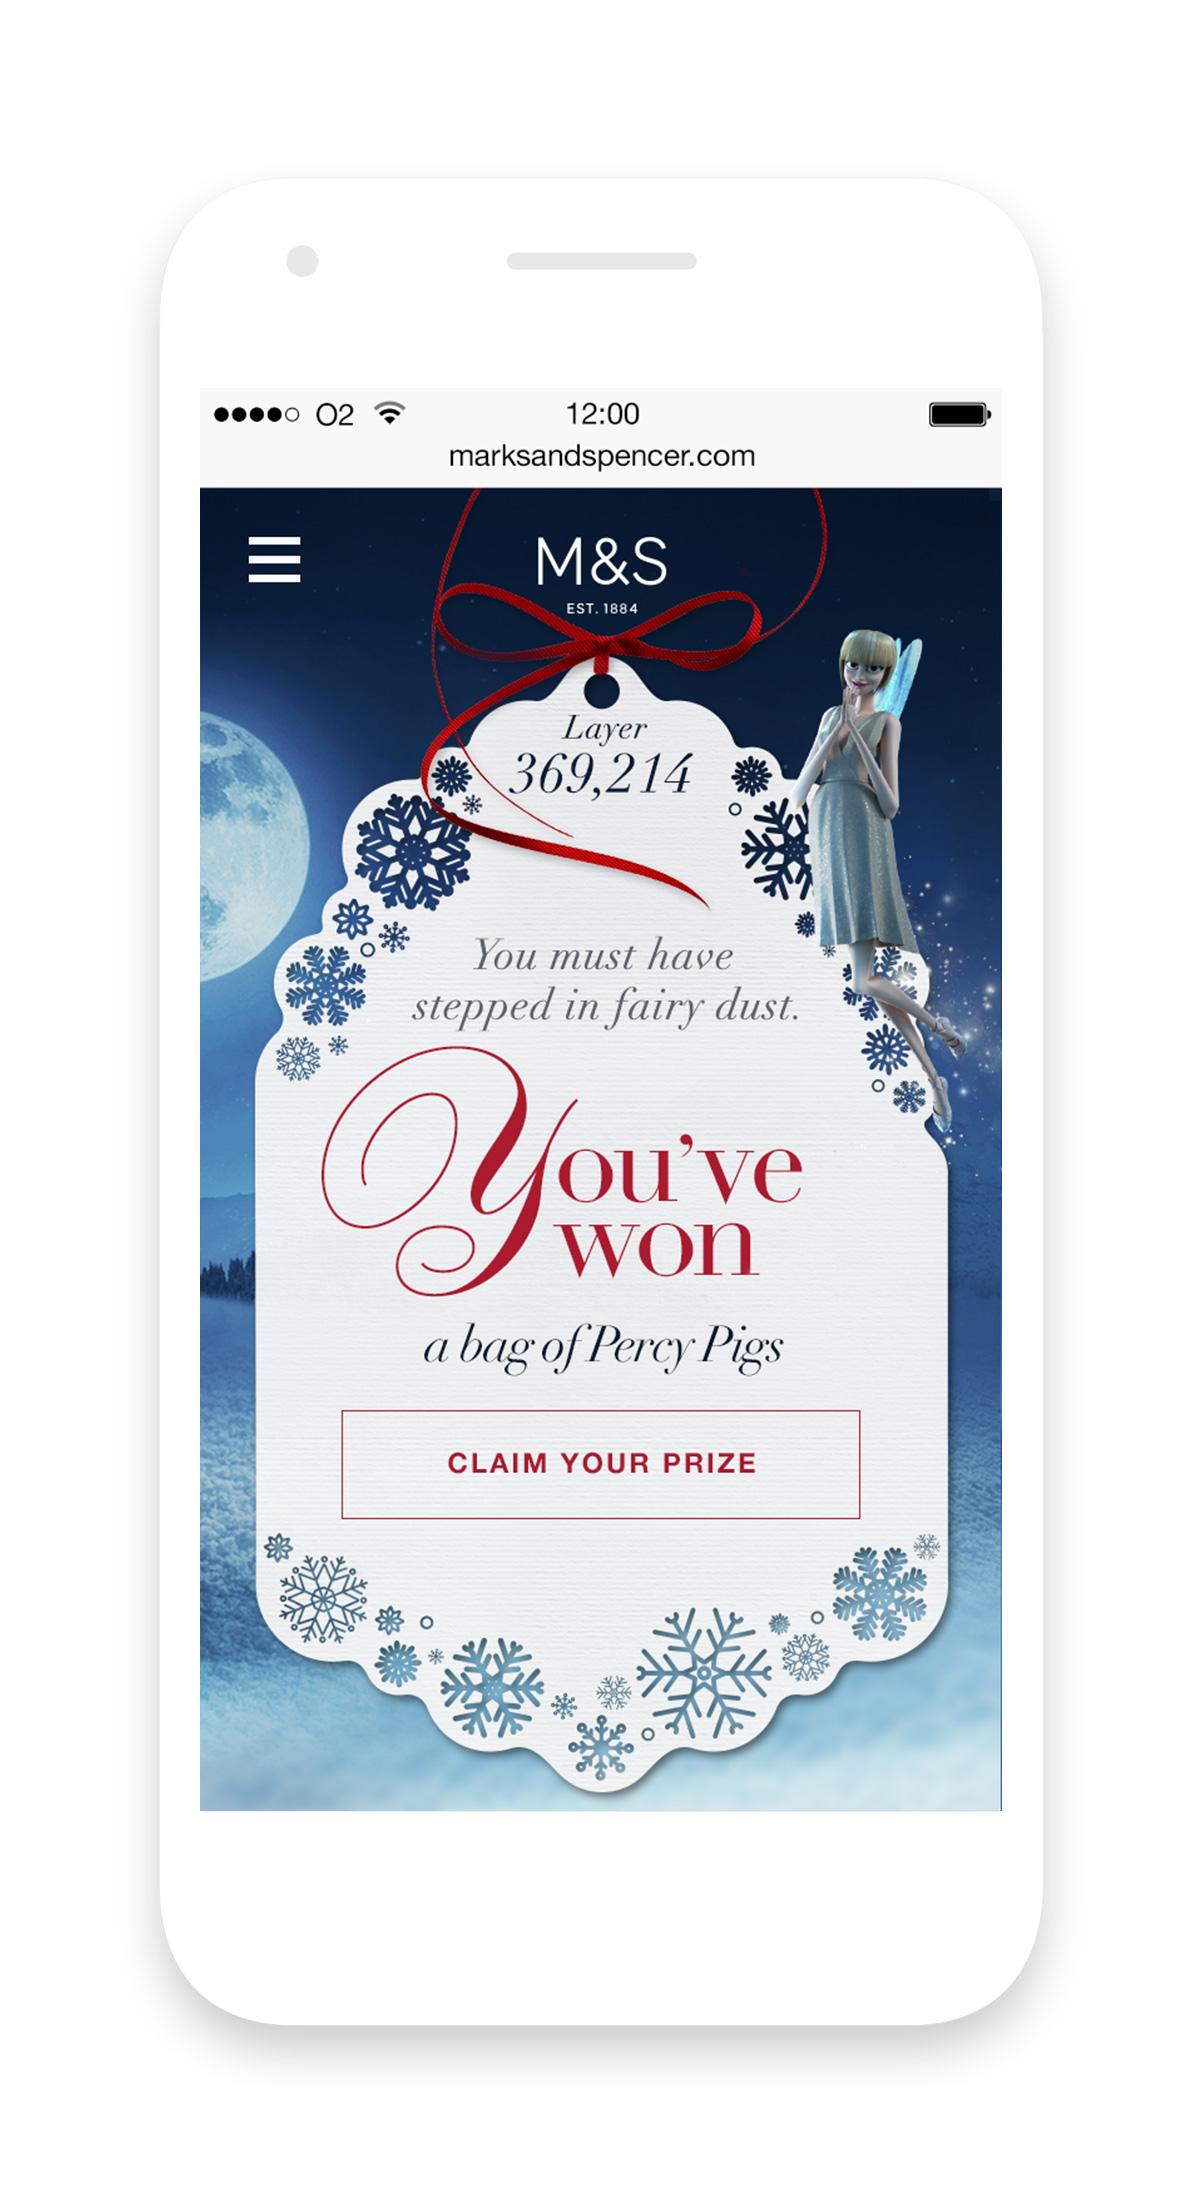 SFS_Mobile_Screen_03.jpg